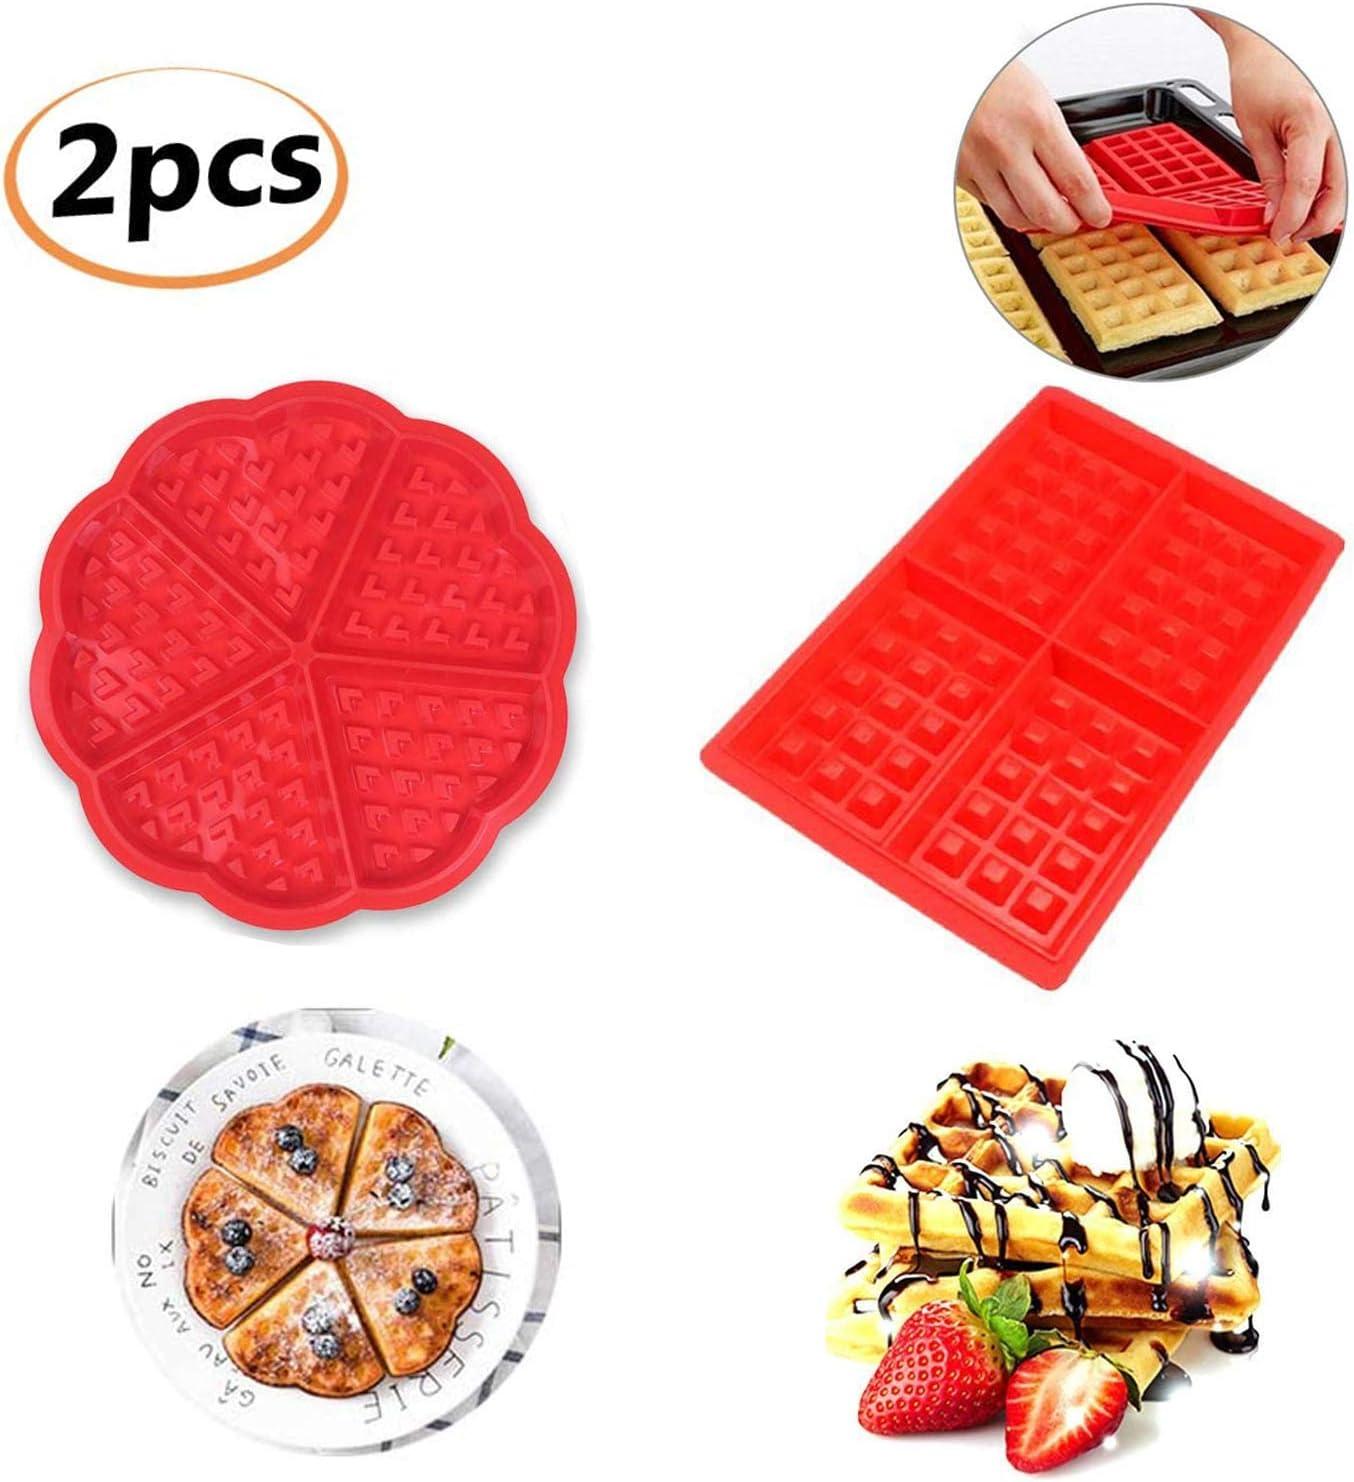 HENJI Molde Gofres Silicona, Moldes Waffle, Galletas para Tarta Muffin Cocina Herramientas, para Lavavajillas, Horno, Microondas, Refrigerador